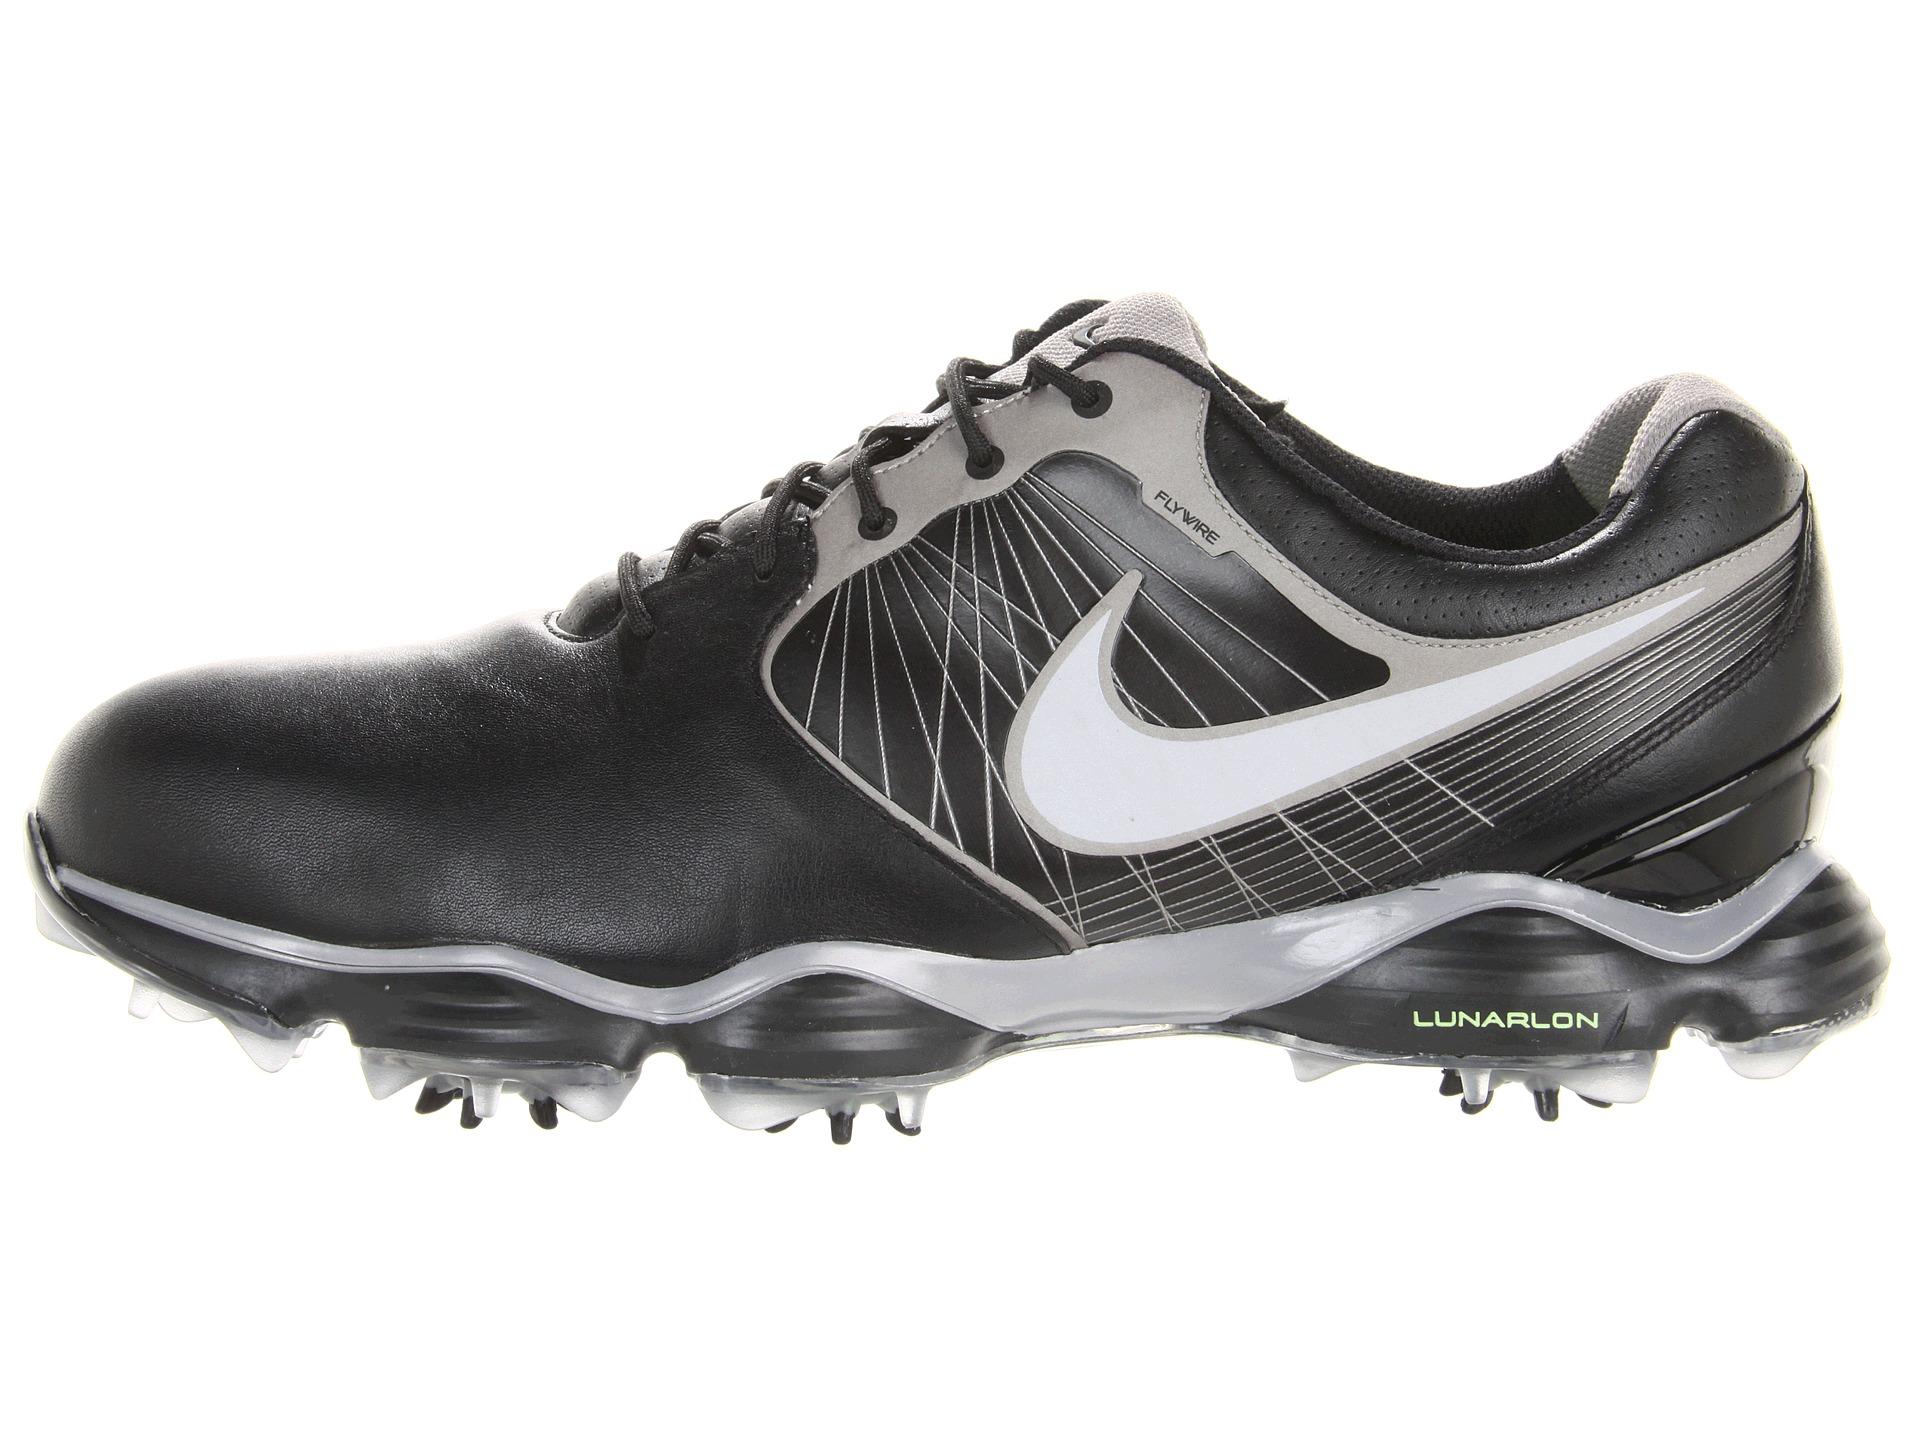 Nike Lunar Control Ii Golf Shoes Volt